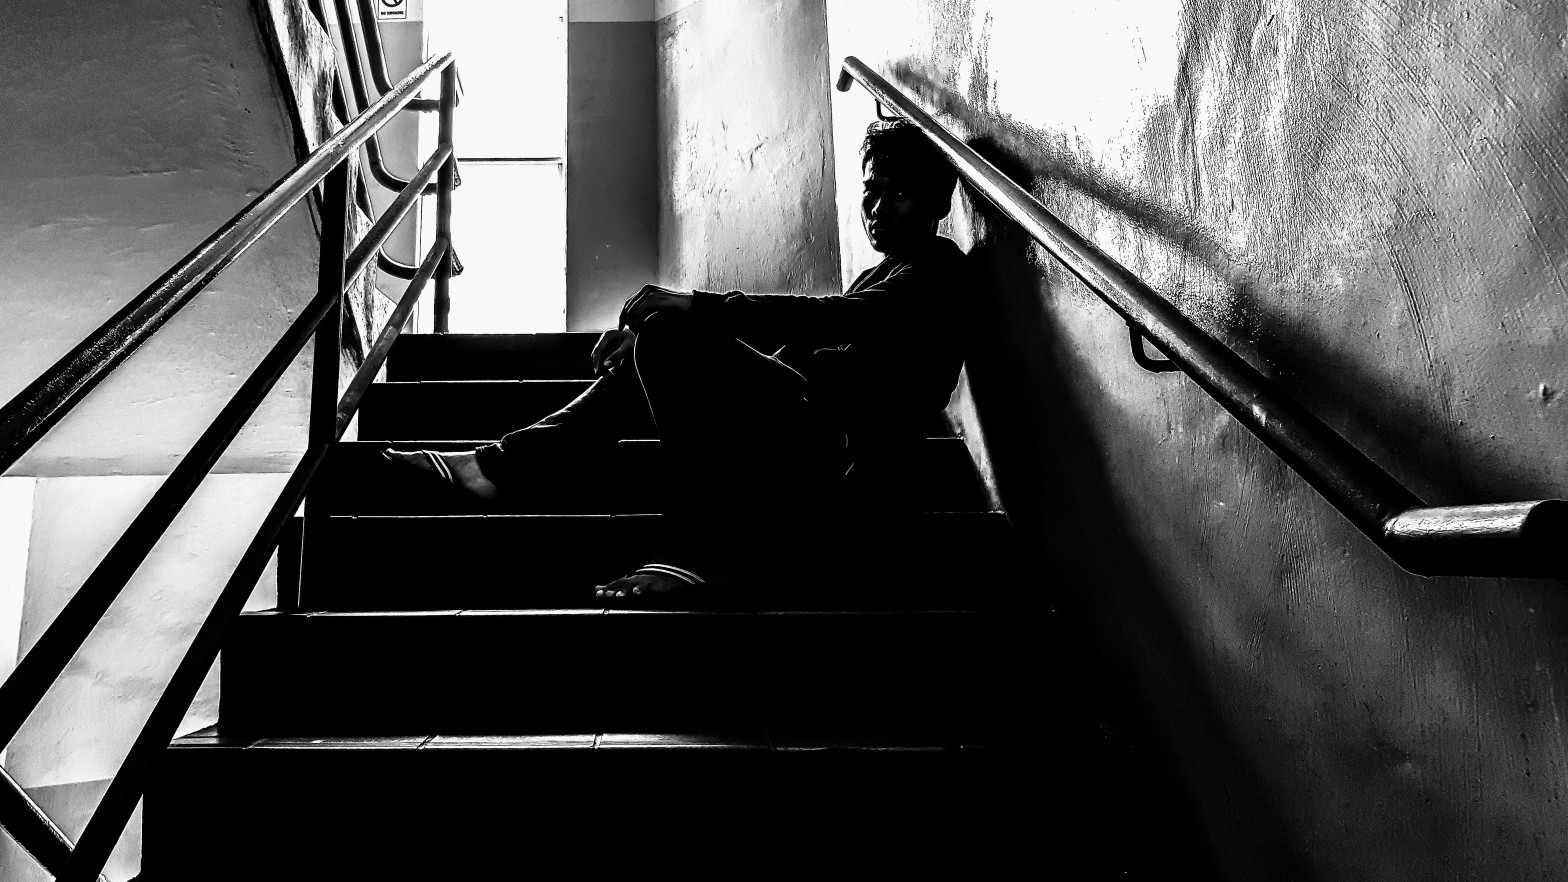 Danish Danial on the staircase shot.